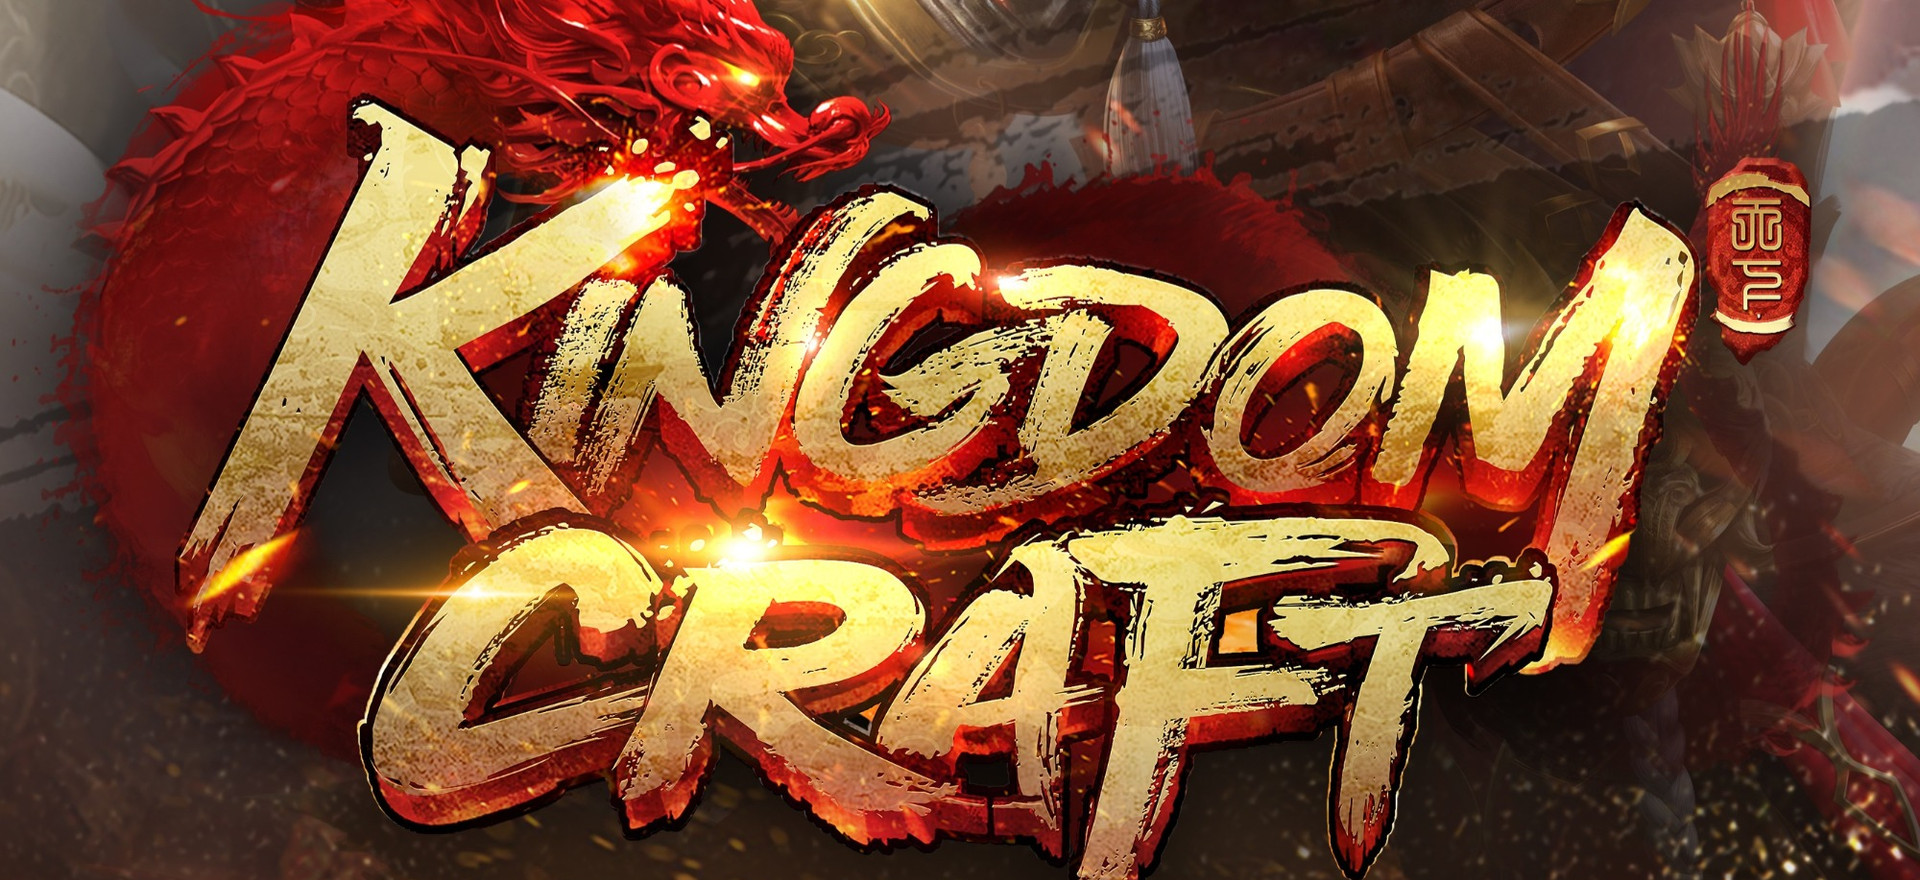 Kingdom Craft (Tencent Games)